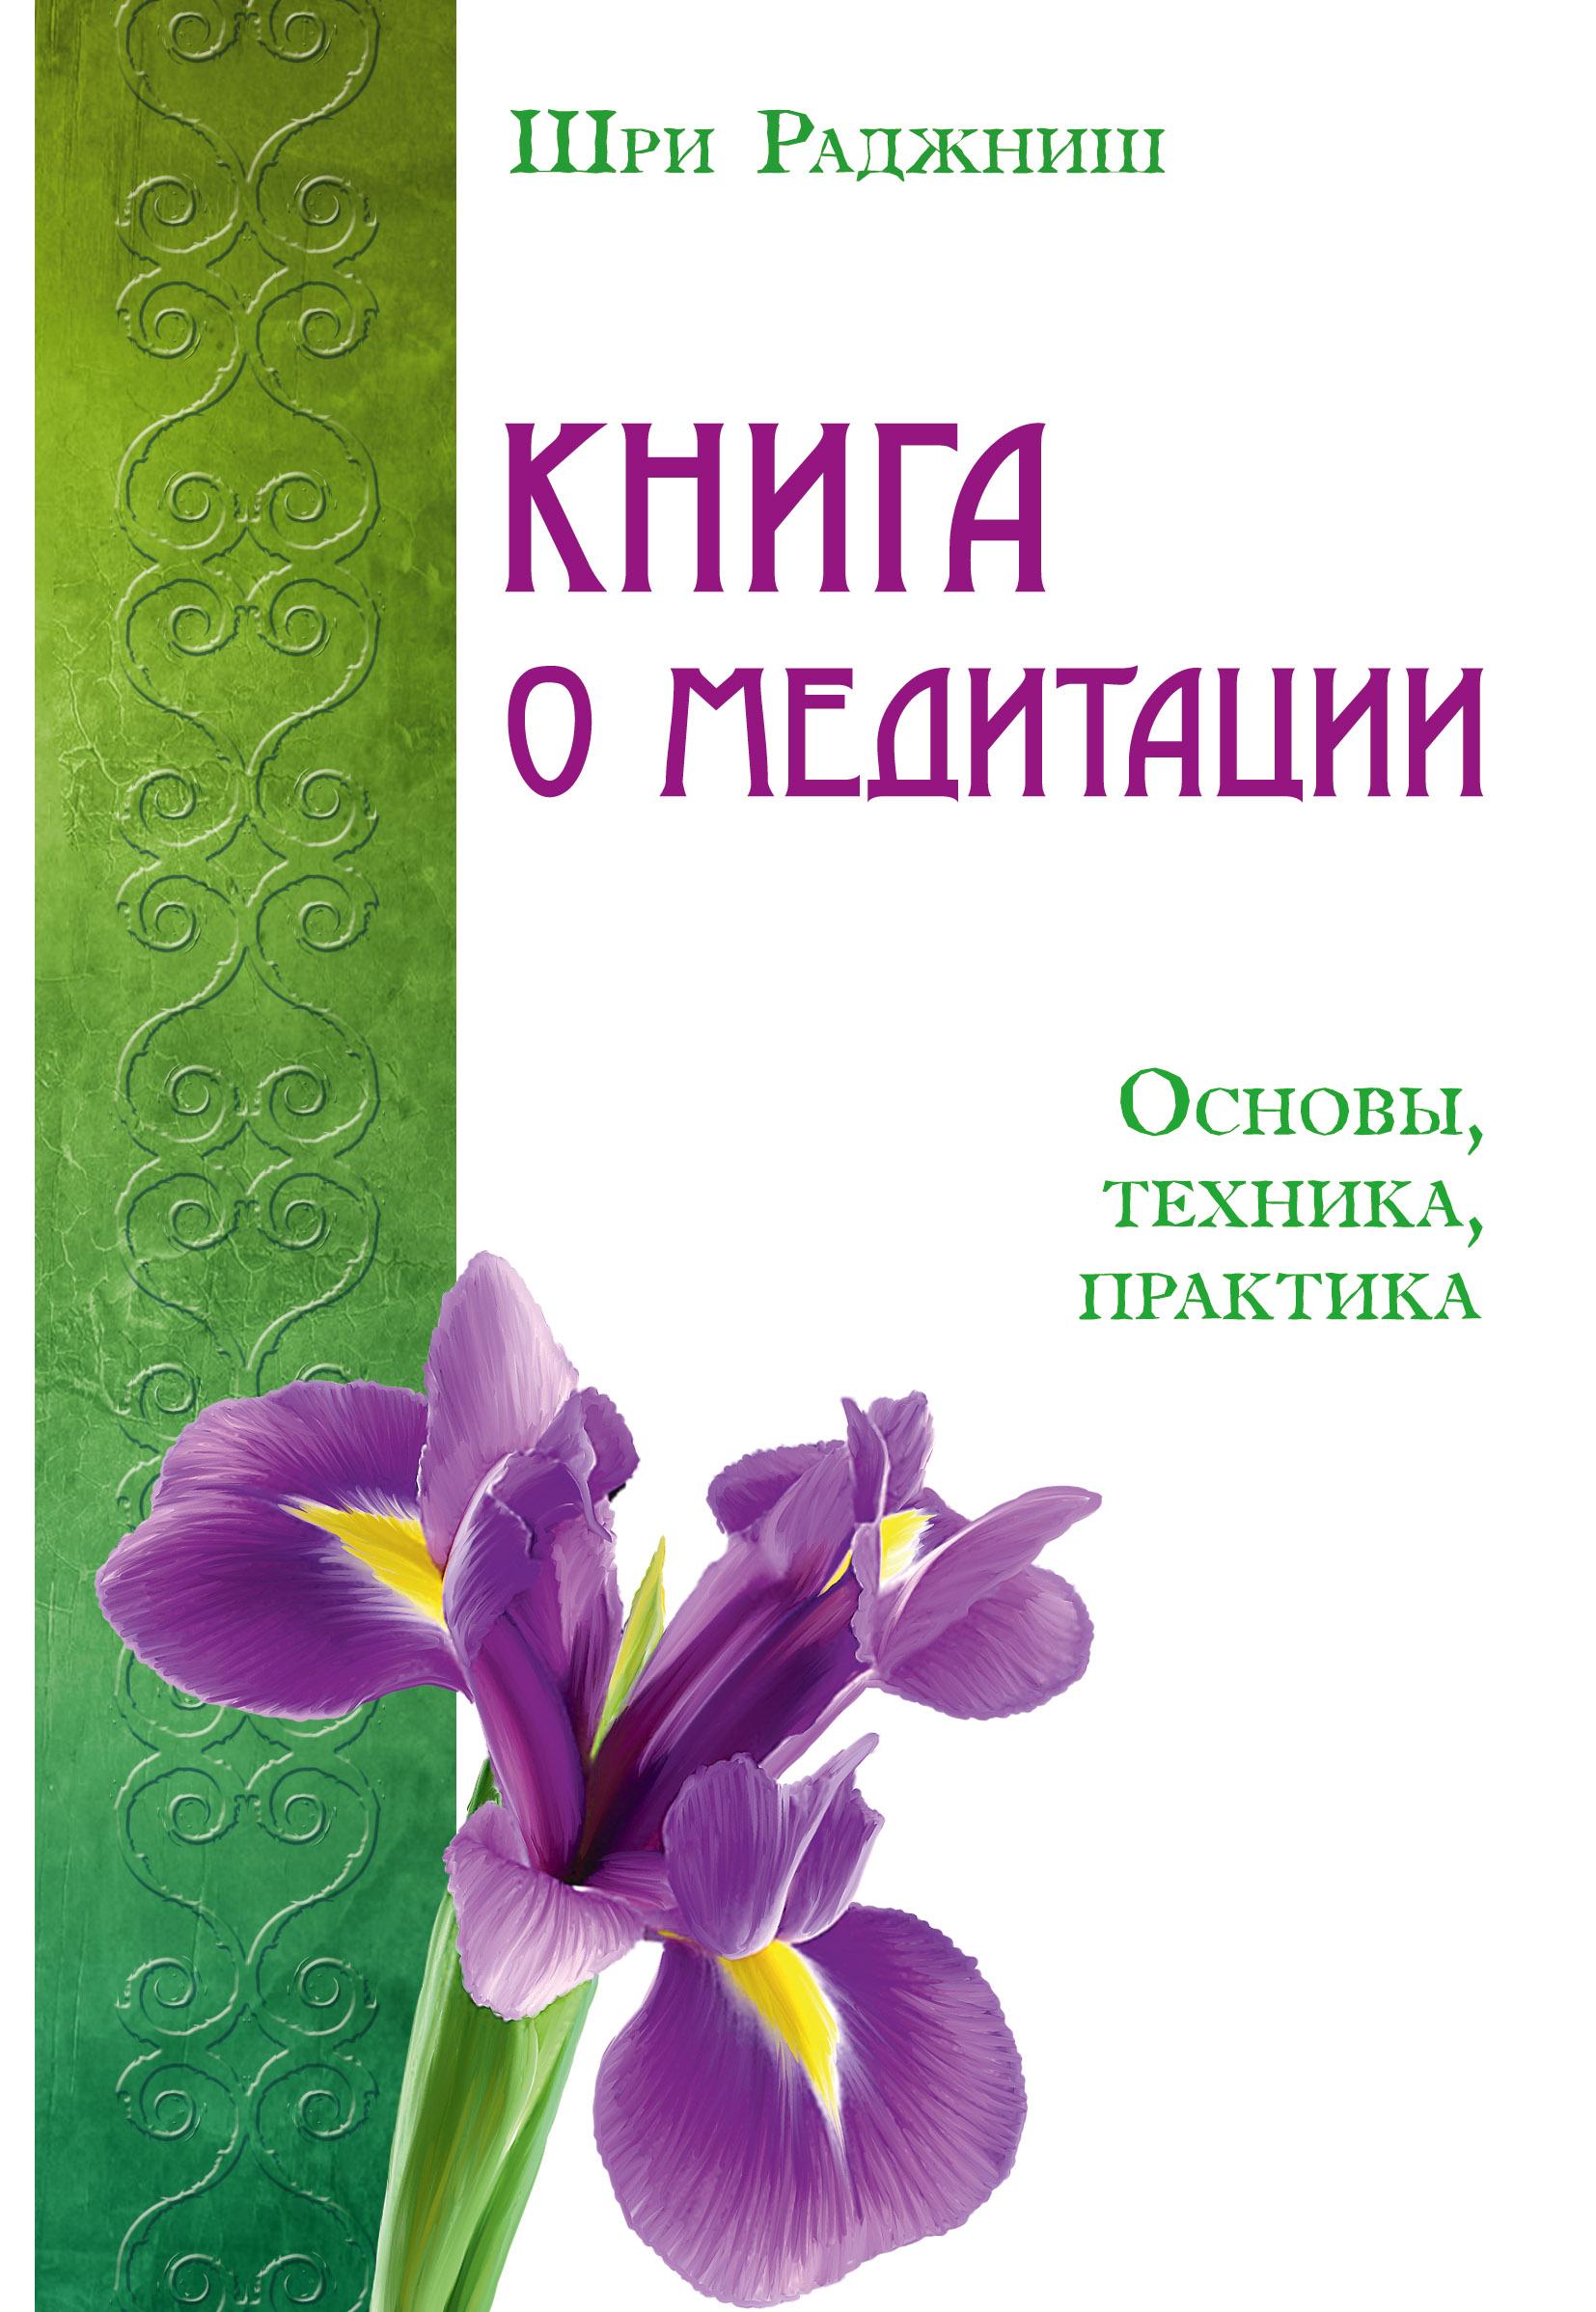 Книга о медитации. Основы, техника, практика